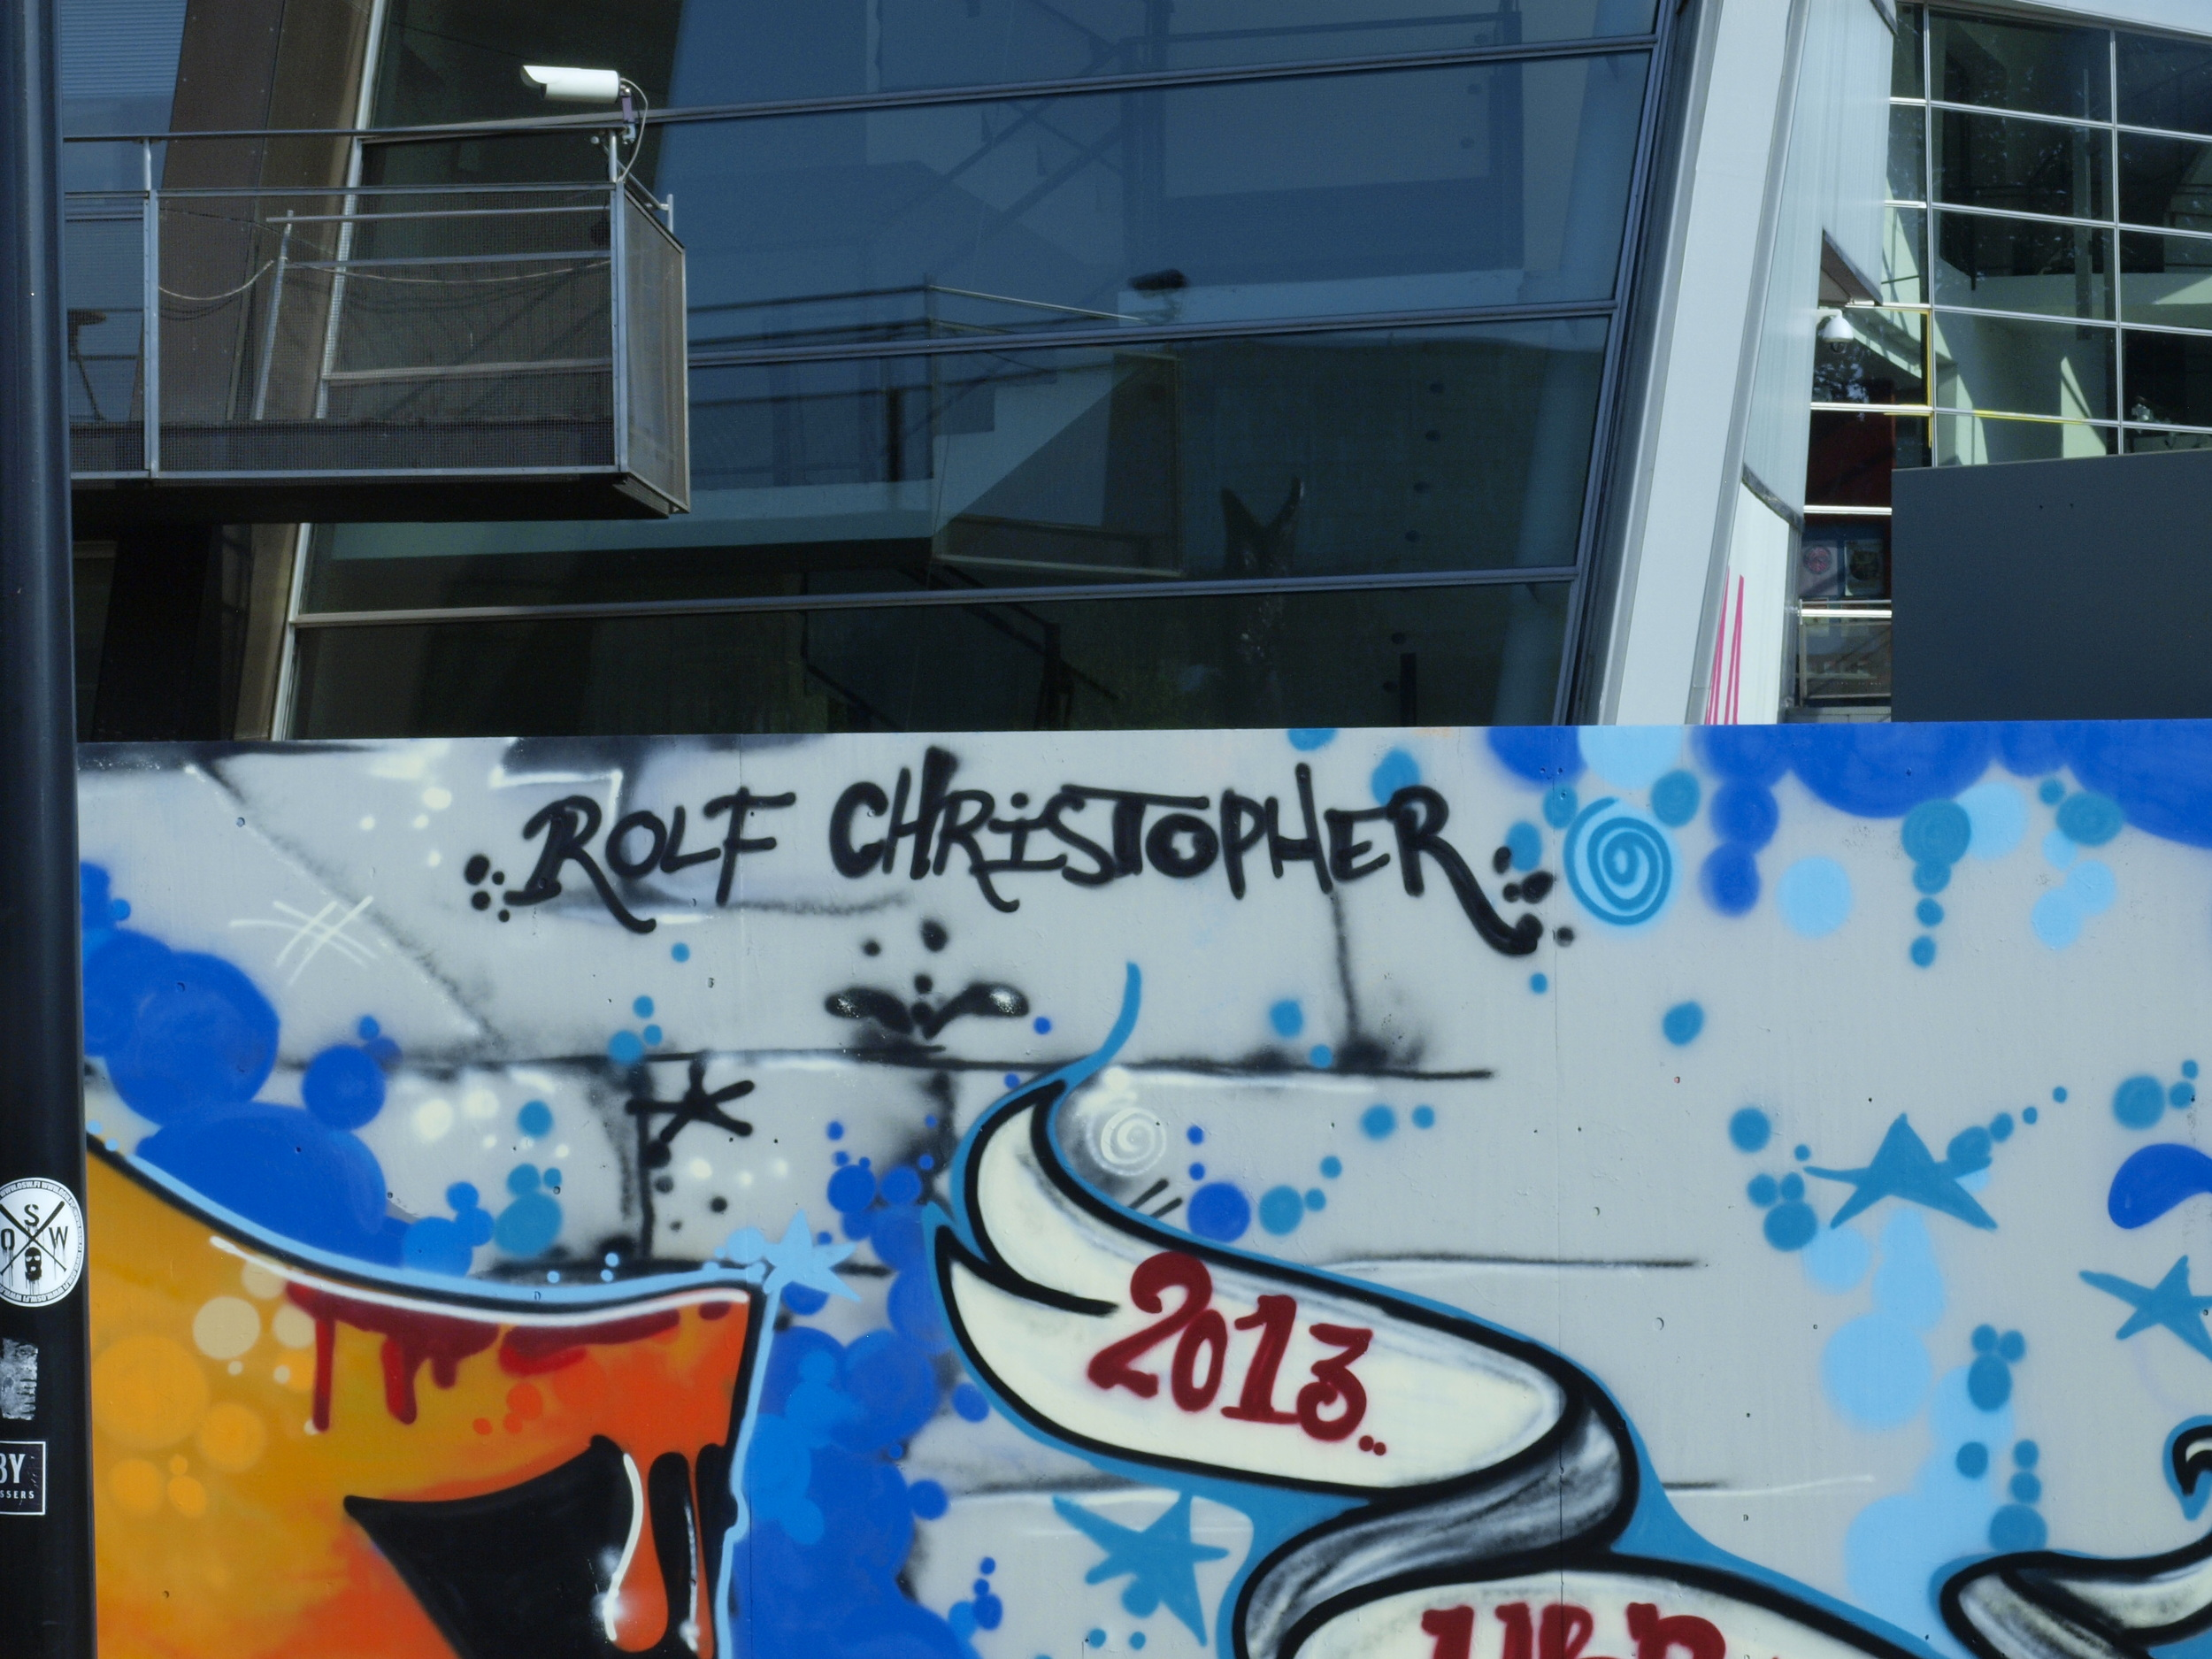 Rolf Cristopher